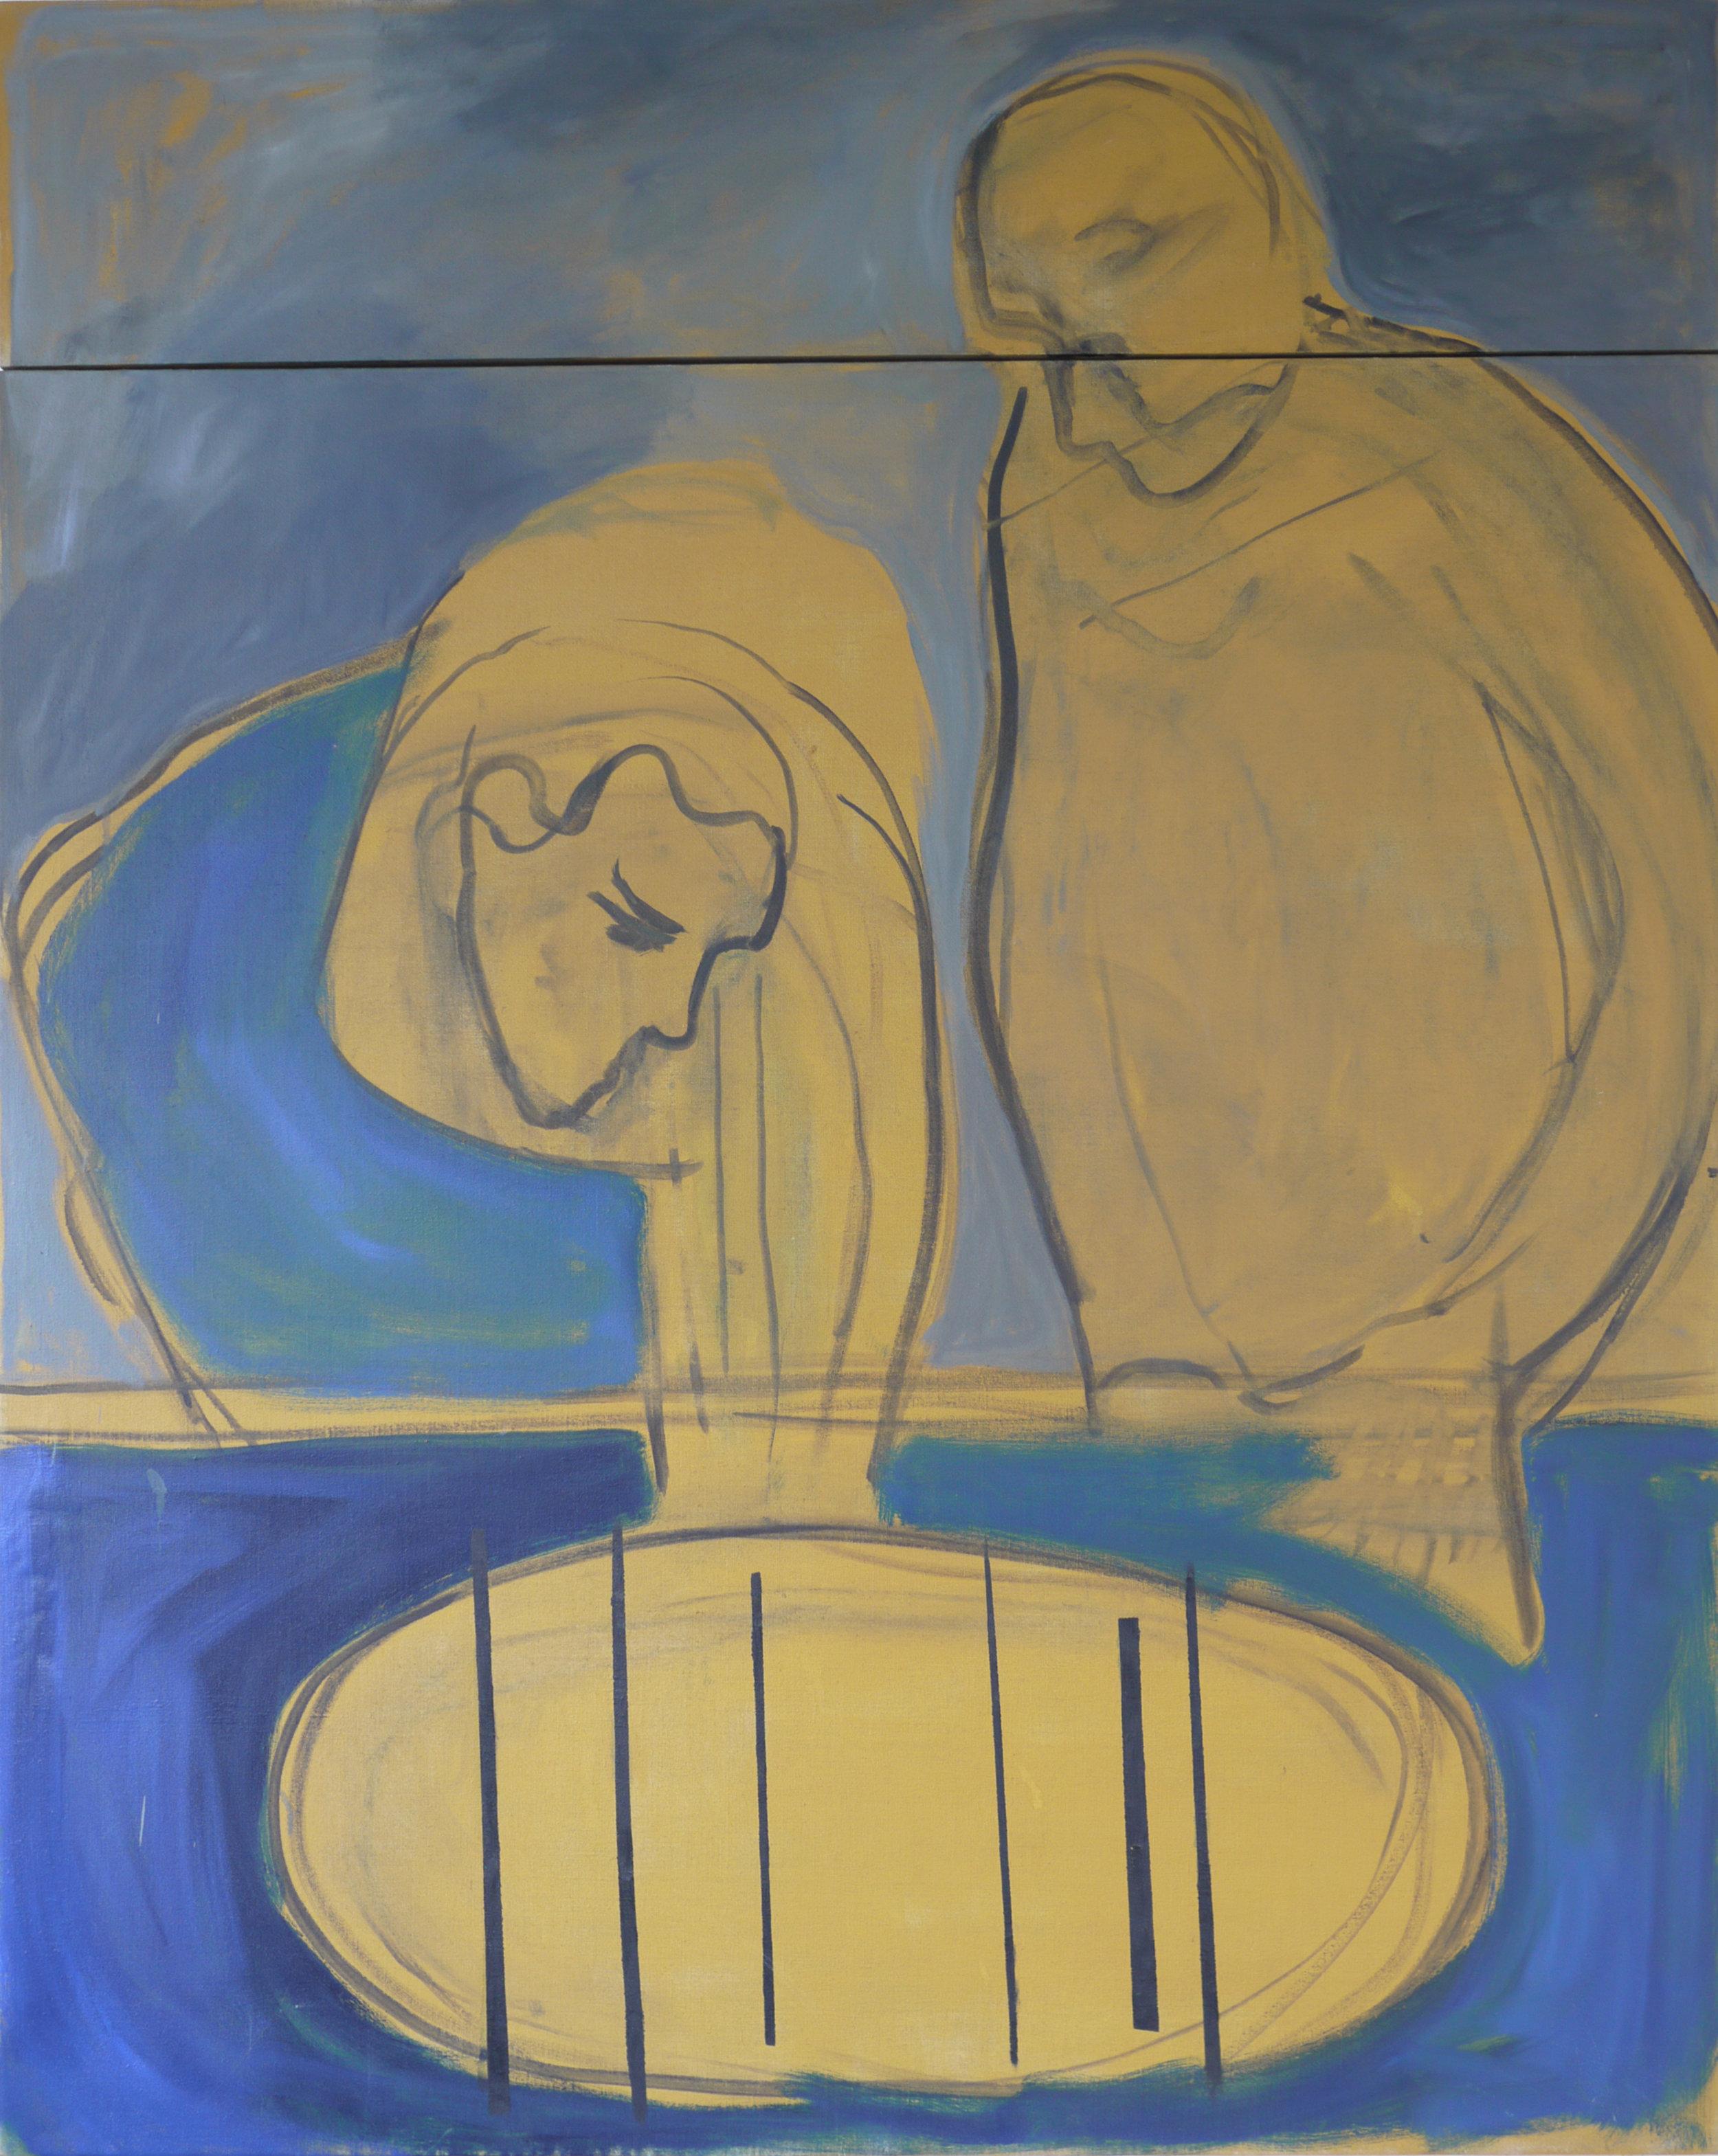 All matter is the same, oil on linen, 153 x 120 cm